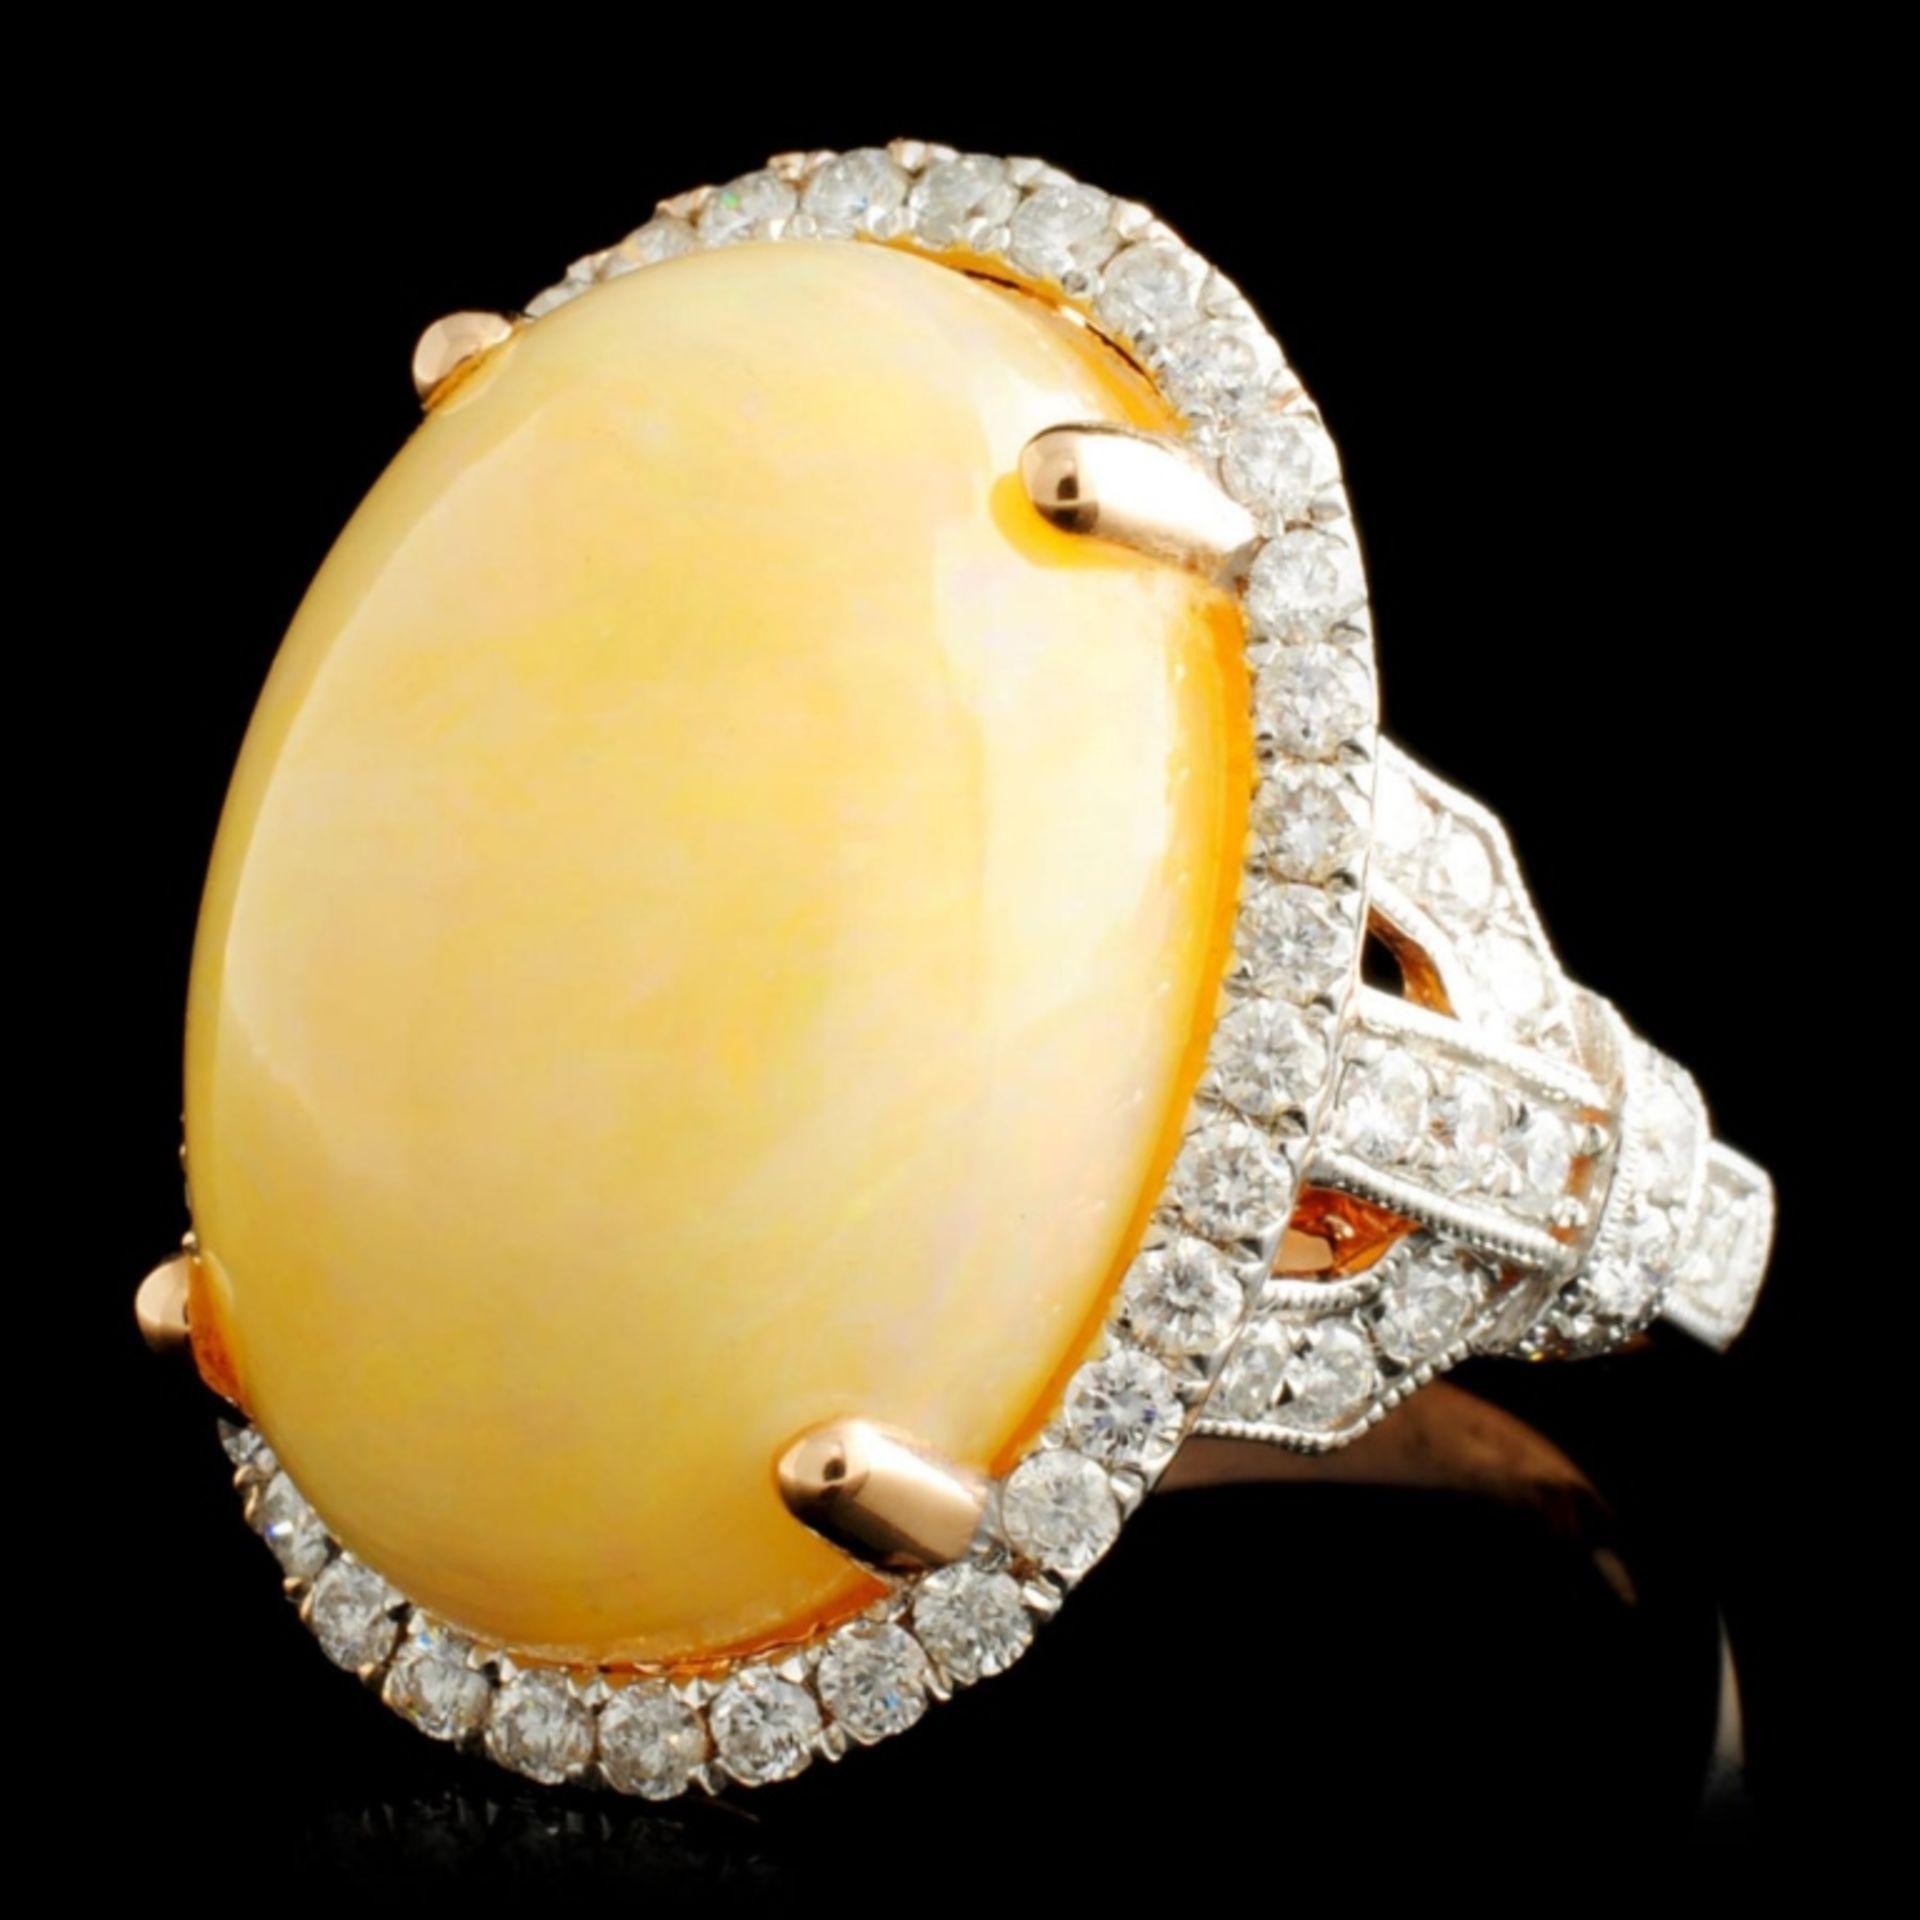 14K Gold 12.04ct Opal & 1.06ctw Diamond Ring - Image 2 of 5